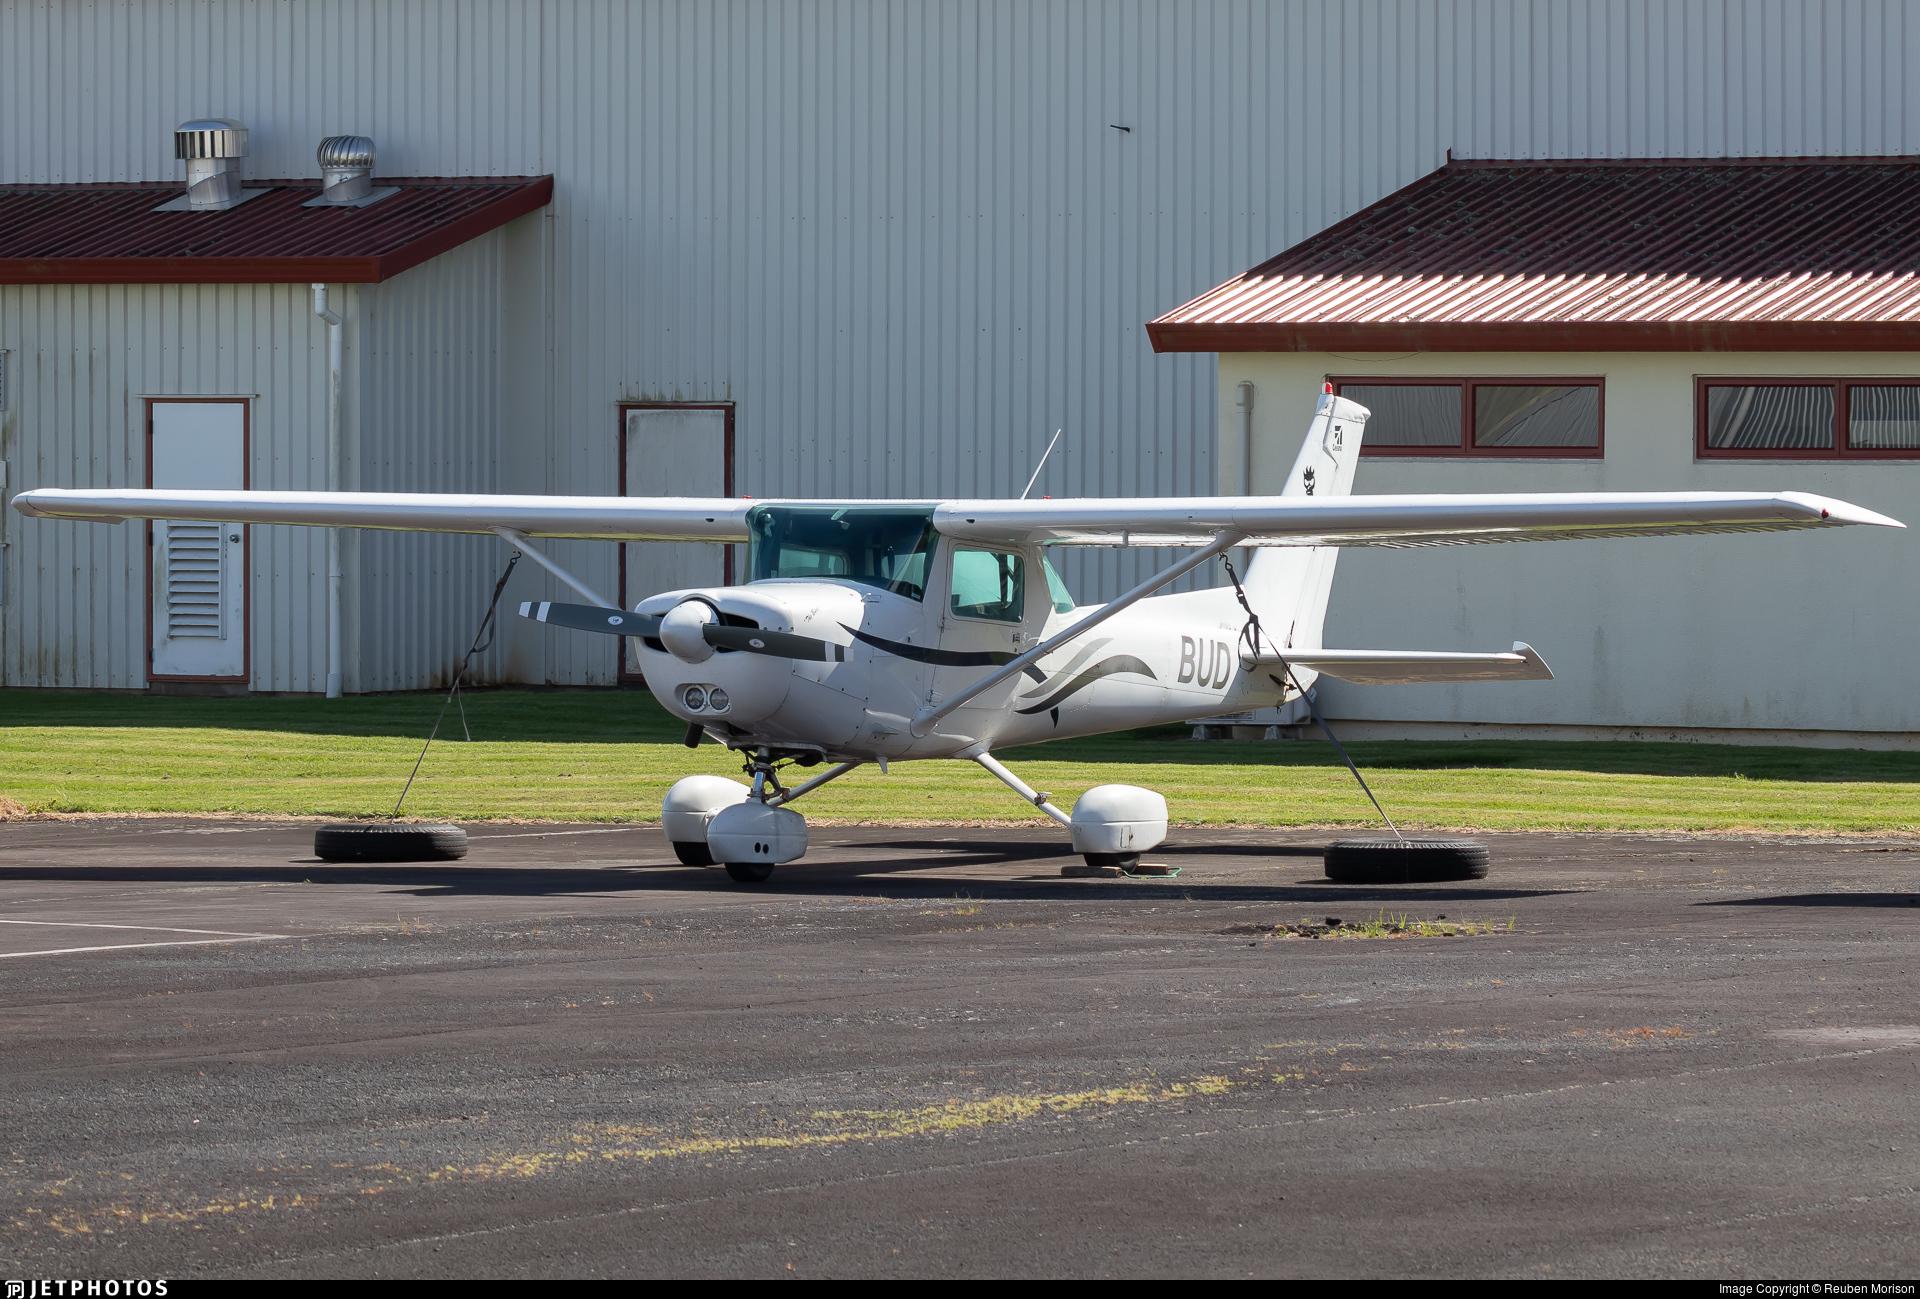 ZK-BUD - Cessna 152 - Private